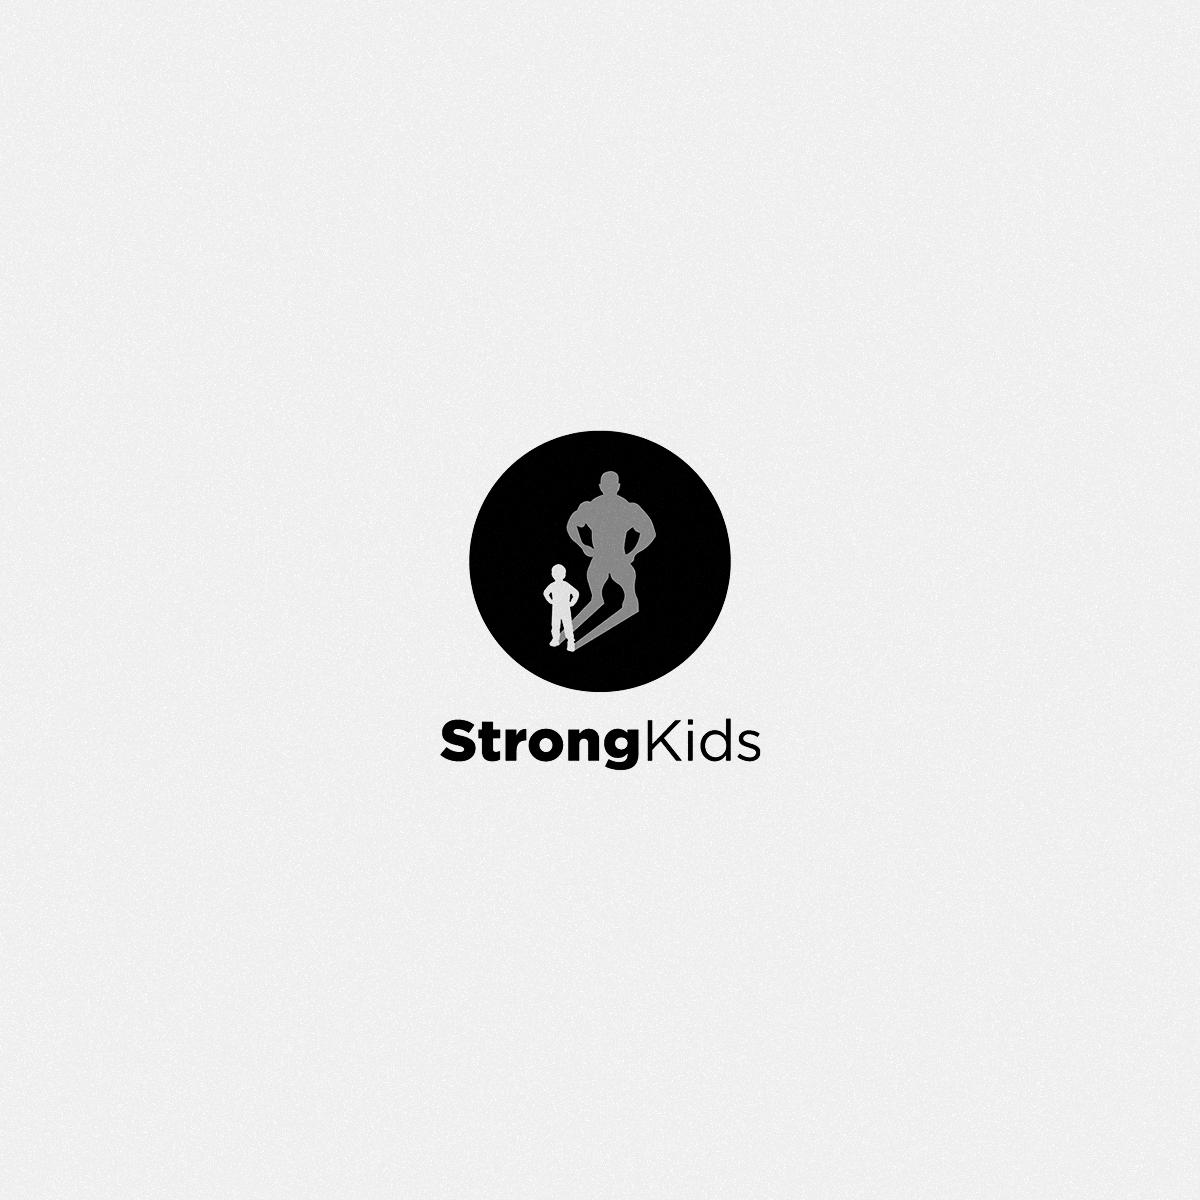 Логотип для Детского Интернет Магазина StrongKids фото f_4495c6ea19690e23.png